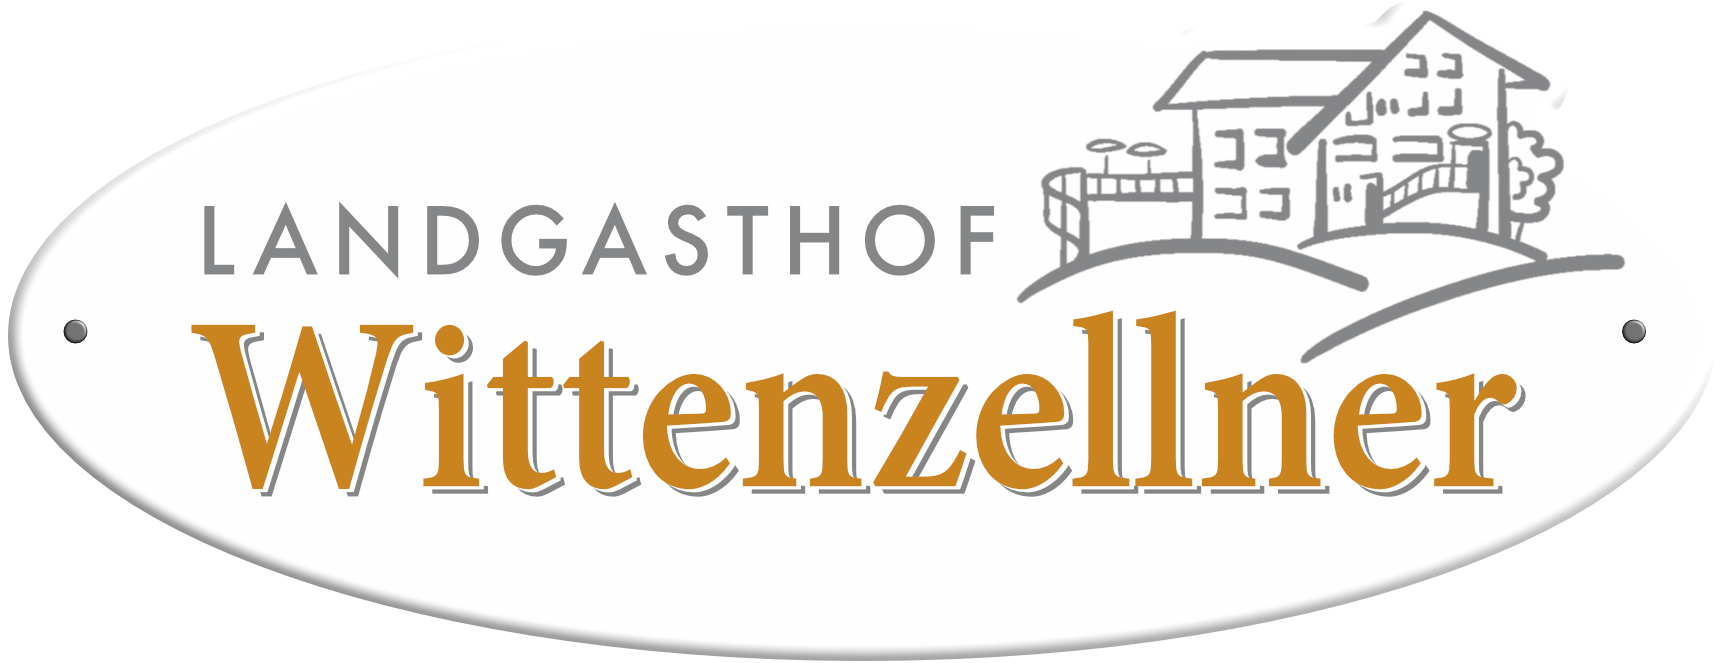 LGH-Wittenzellner Logo